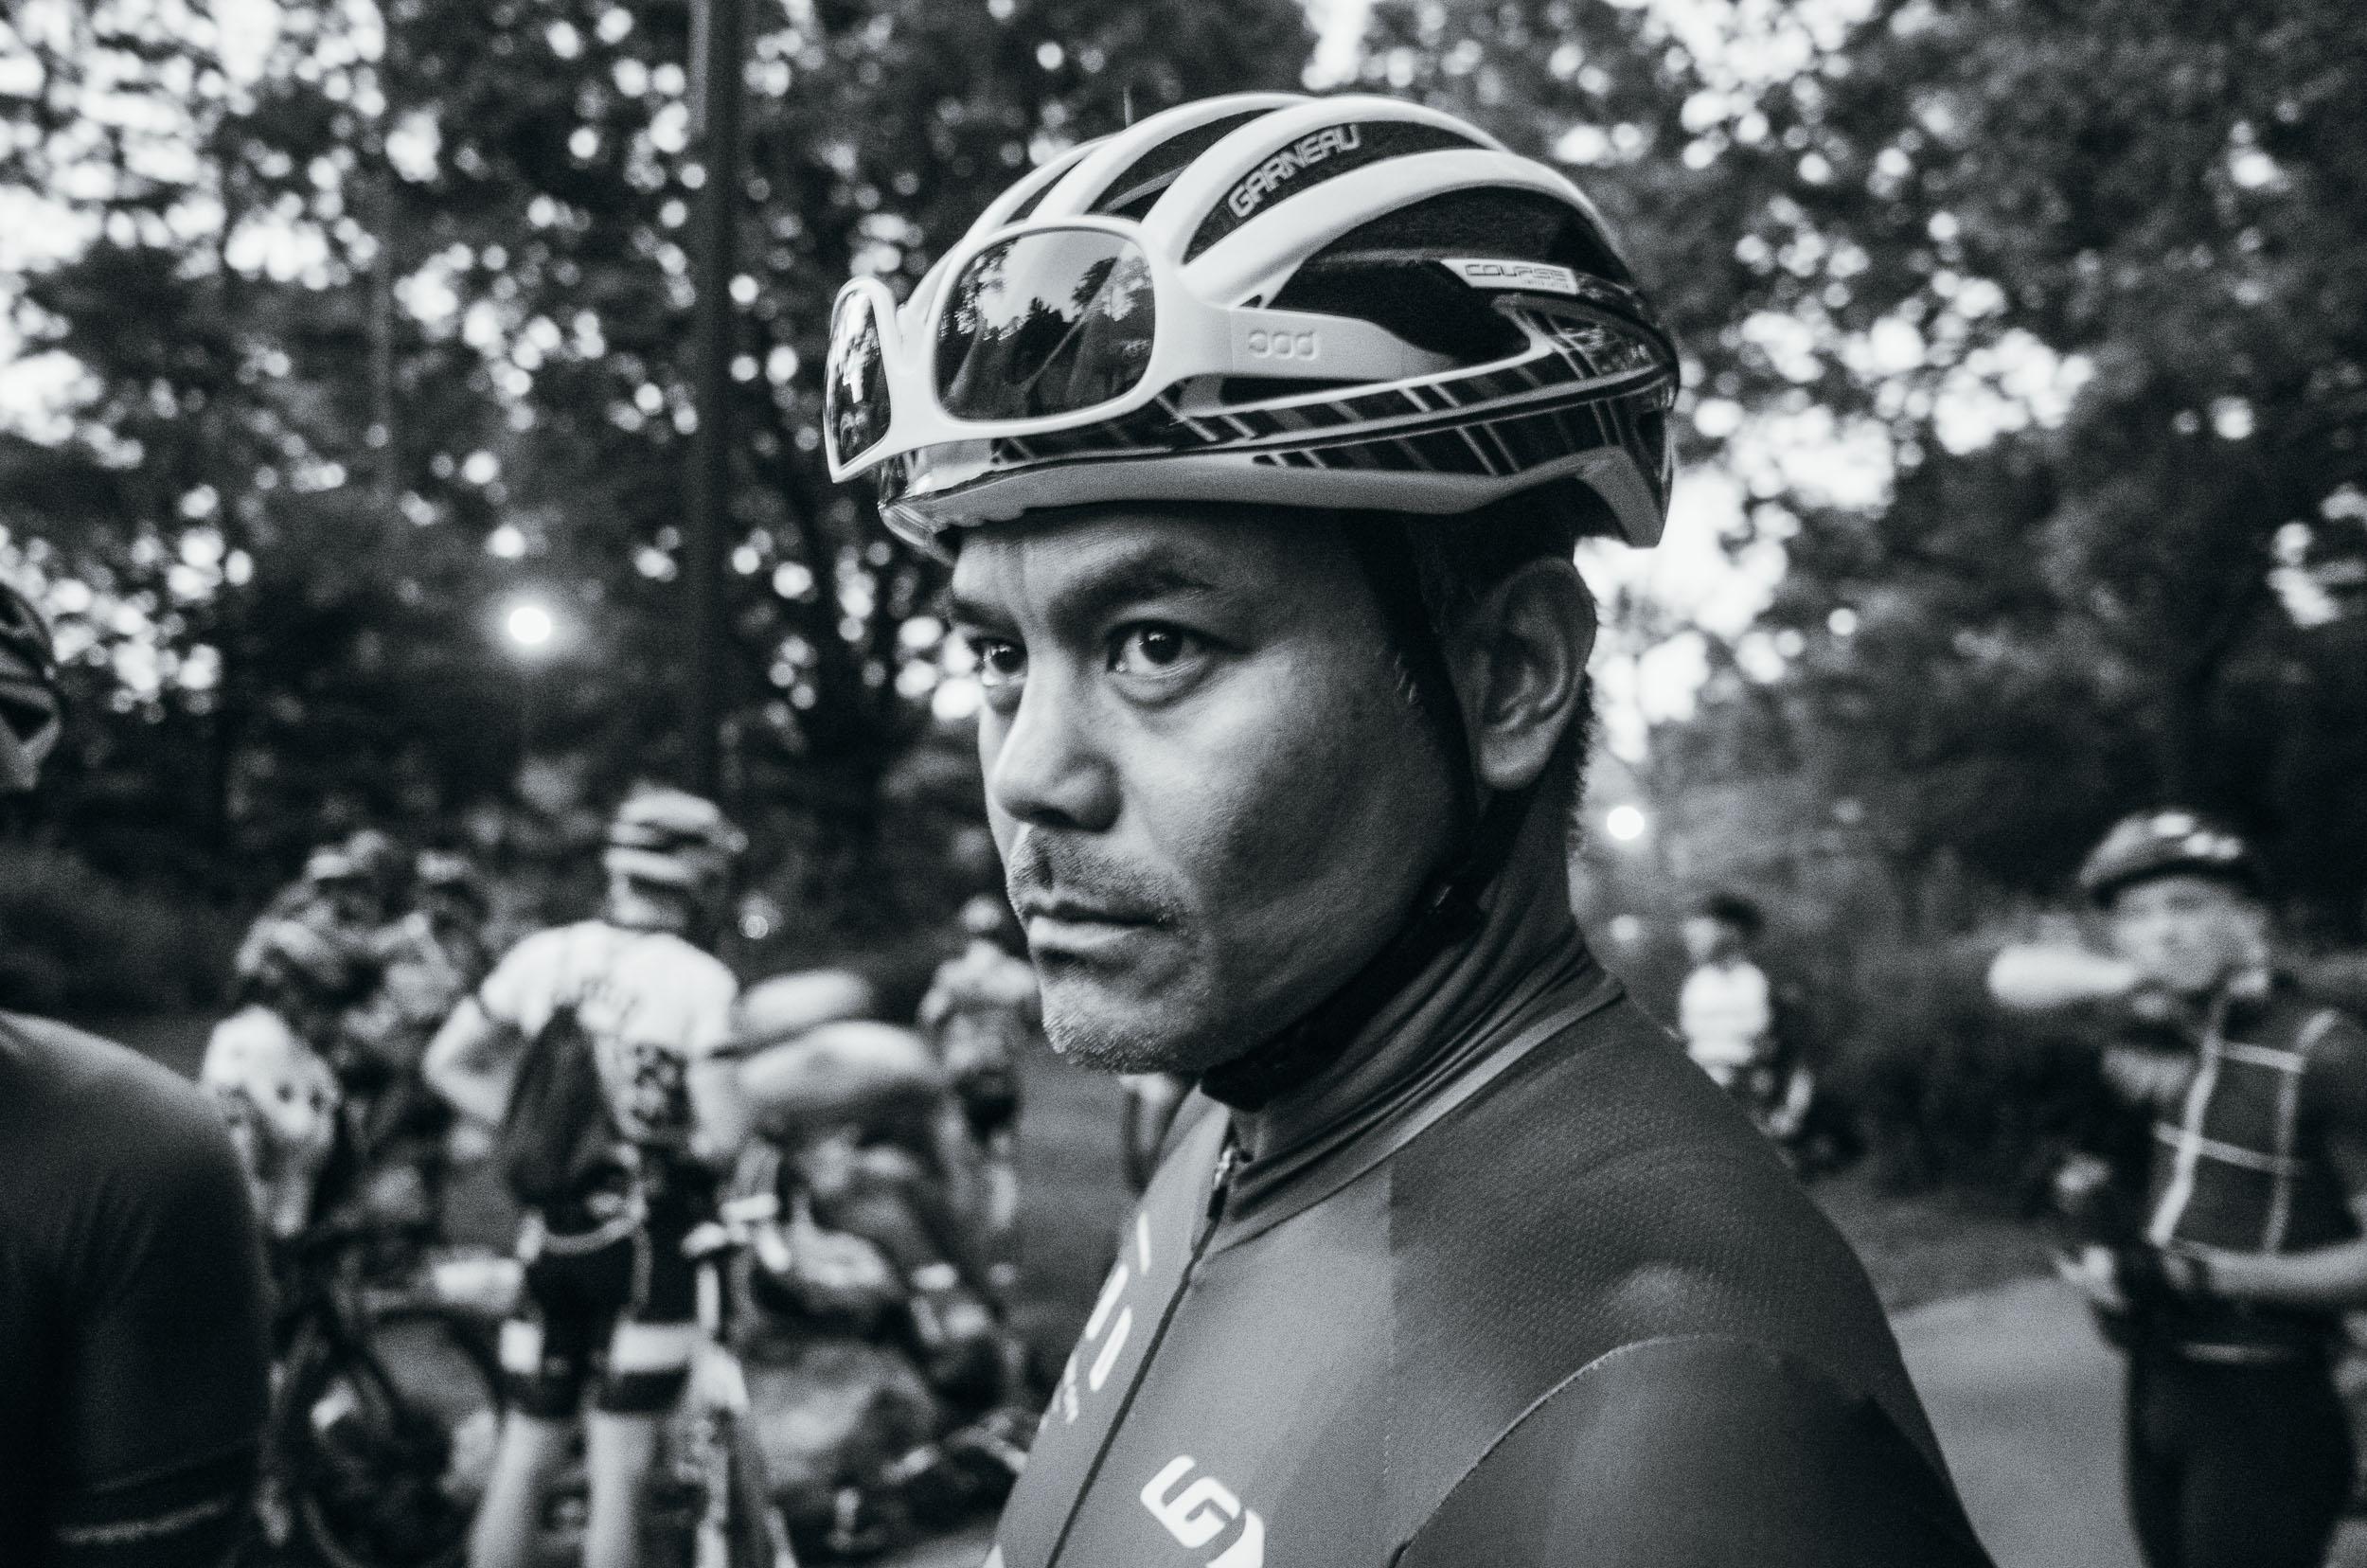 photo-rhetoric-to-be-determined-crca-club-race-110.jpg